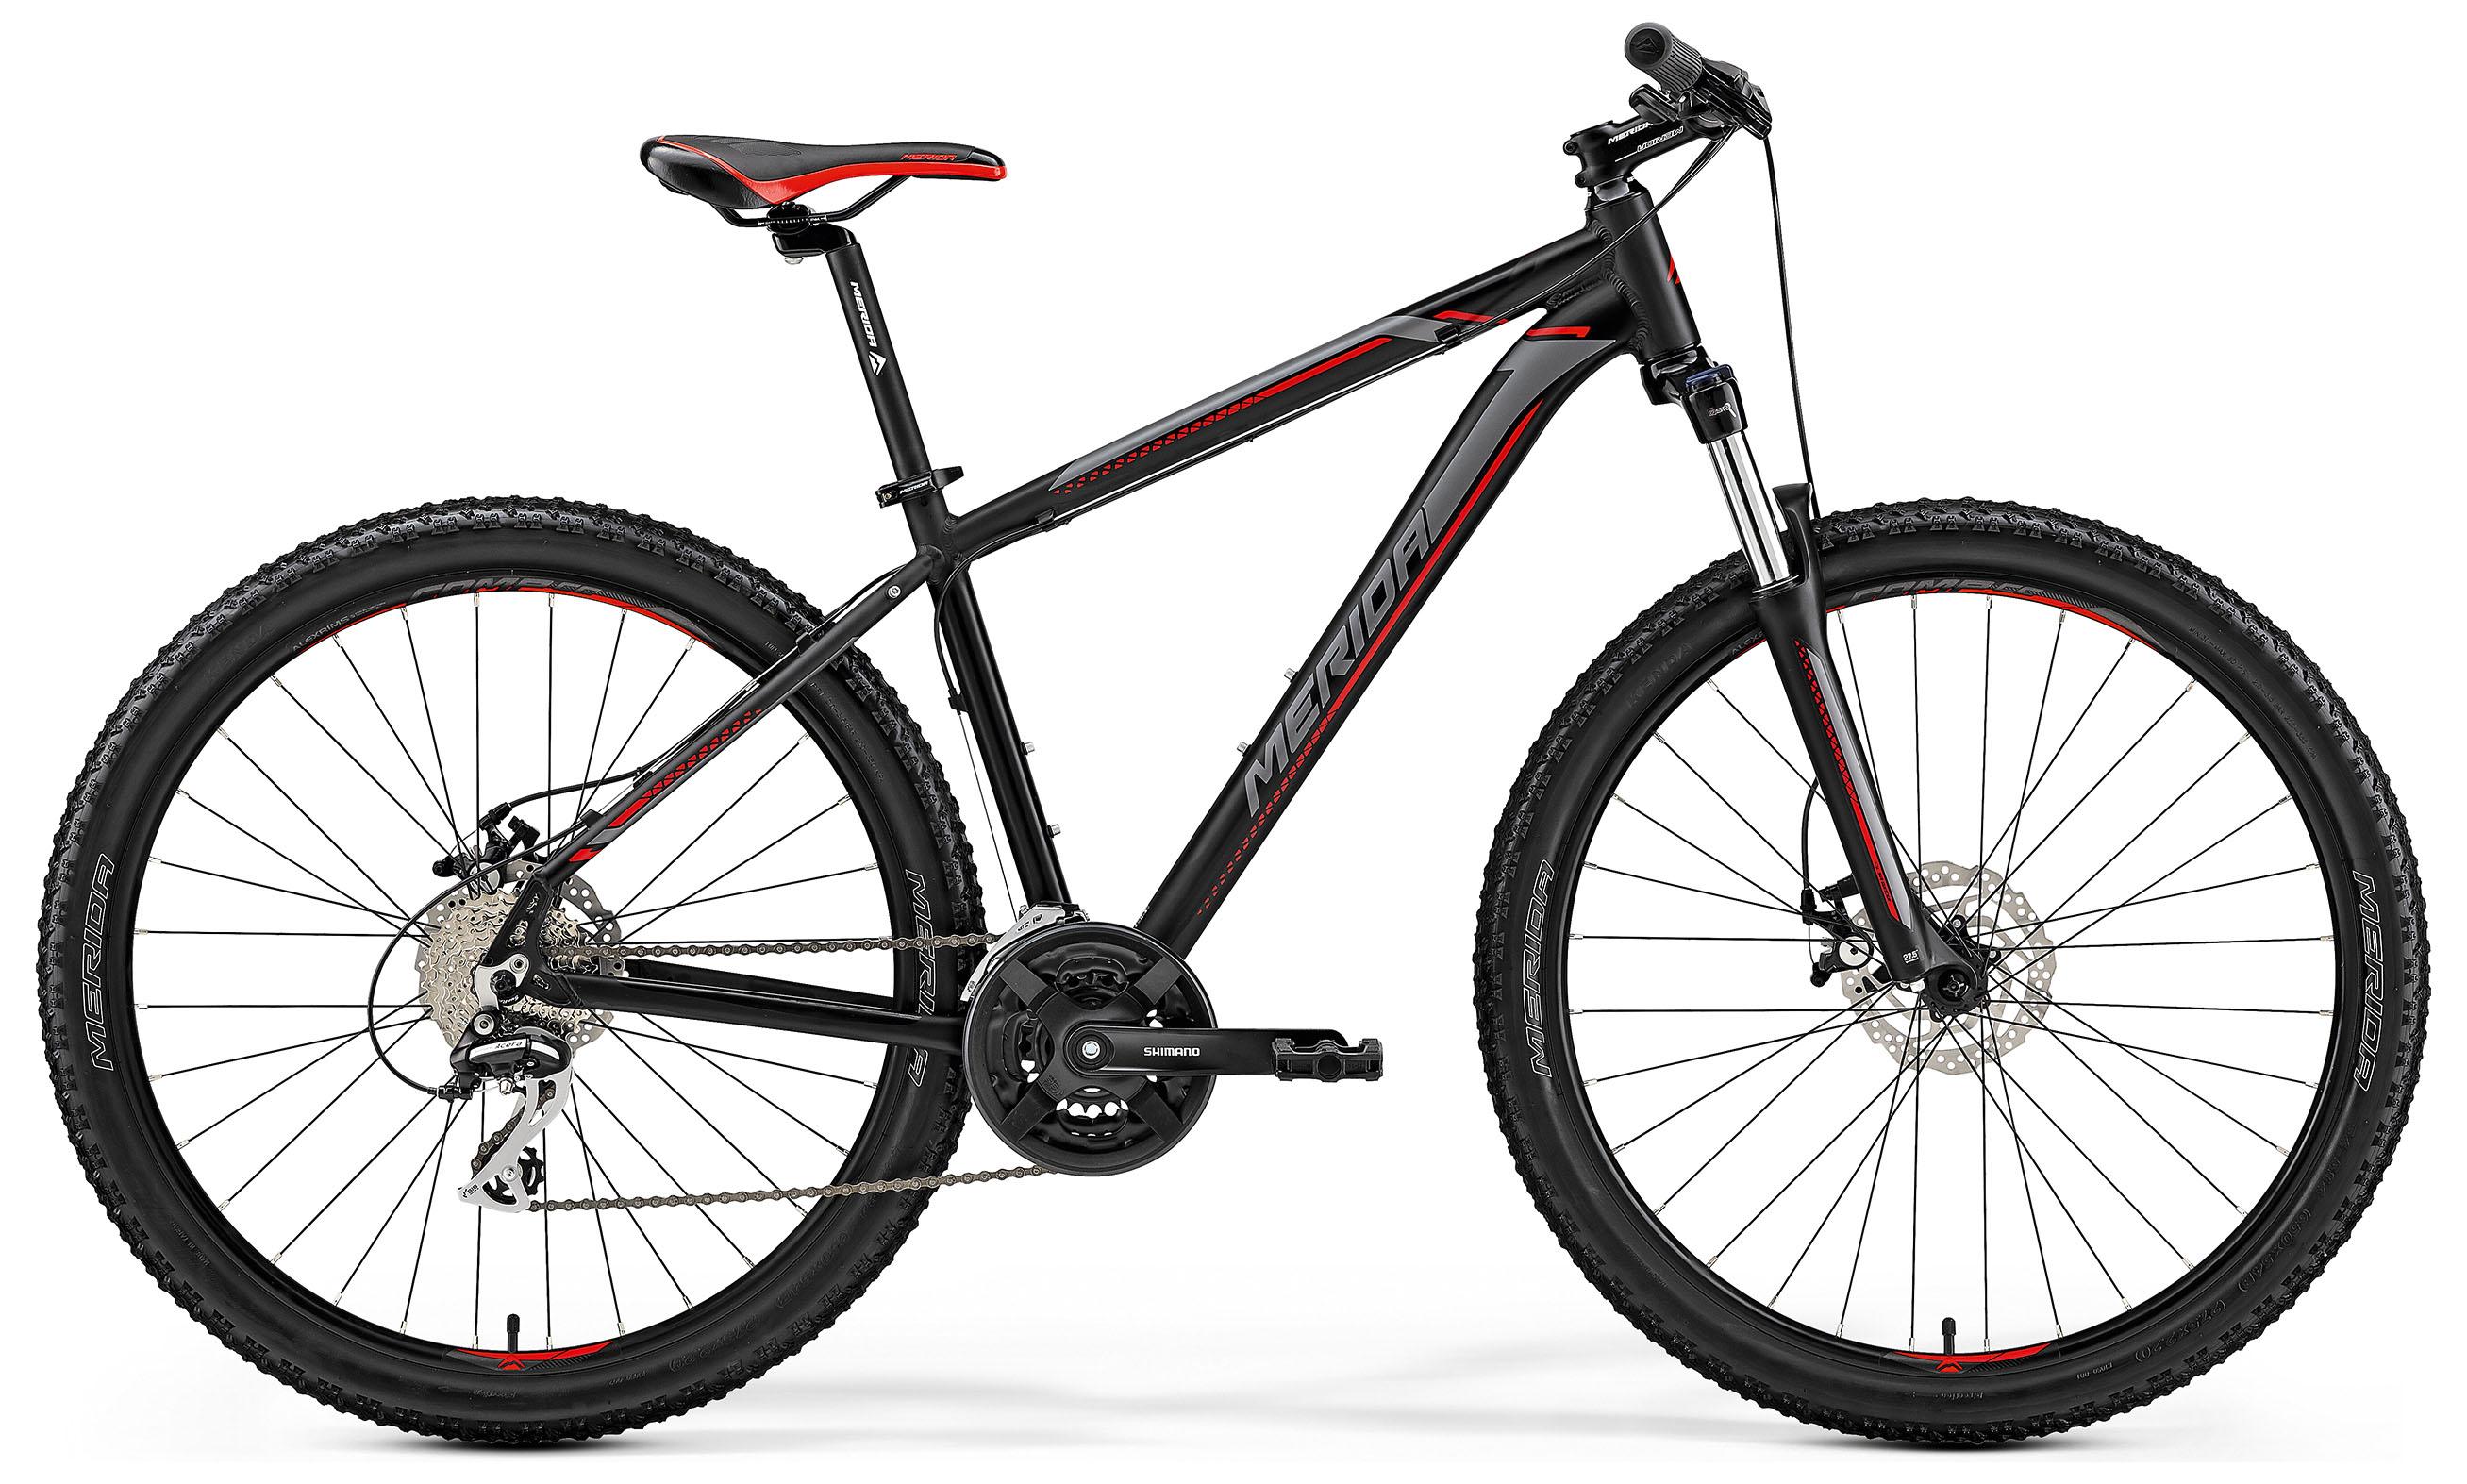 Велосипед Merida Big.Seven 20-MD 2019 велосипед merida crossway 40 md lady 2013